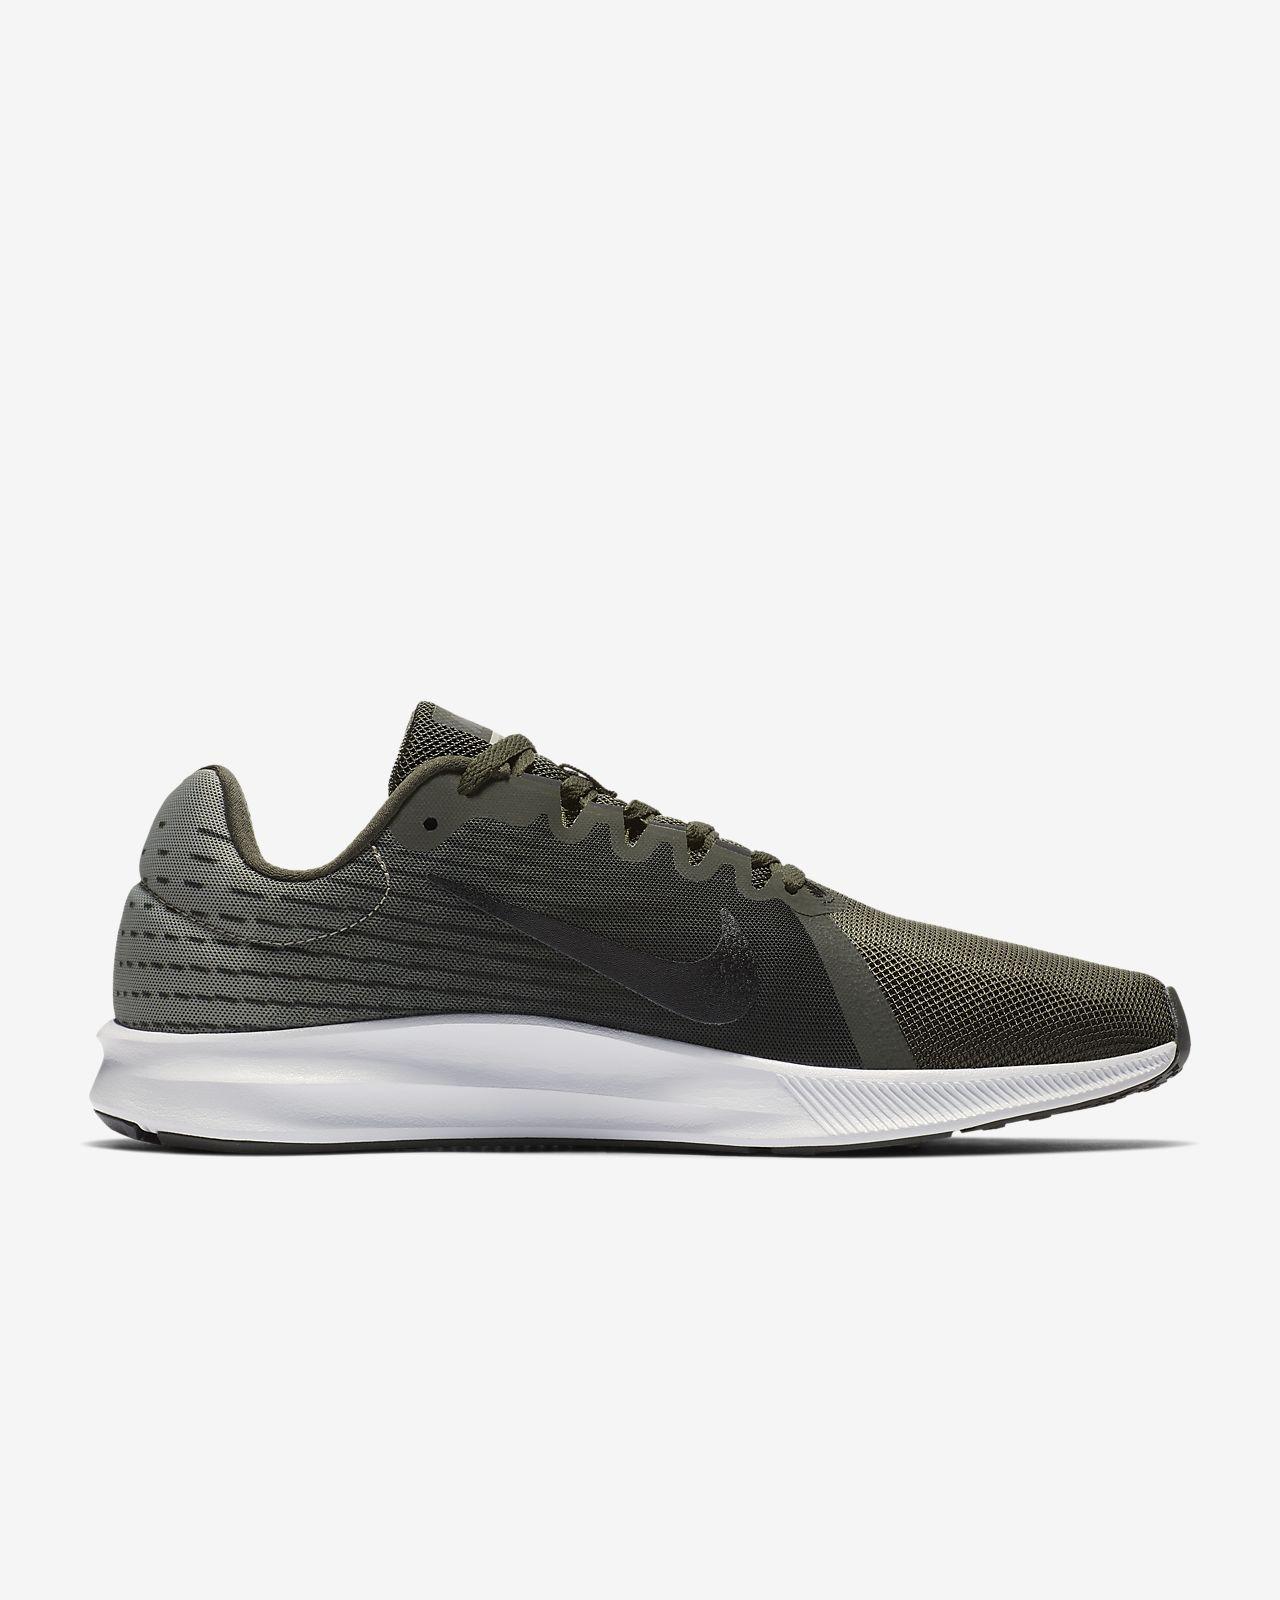 7dd4de71f6615 Calzado de running para hombre Nike Downshifter 8. Nike.com CL